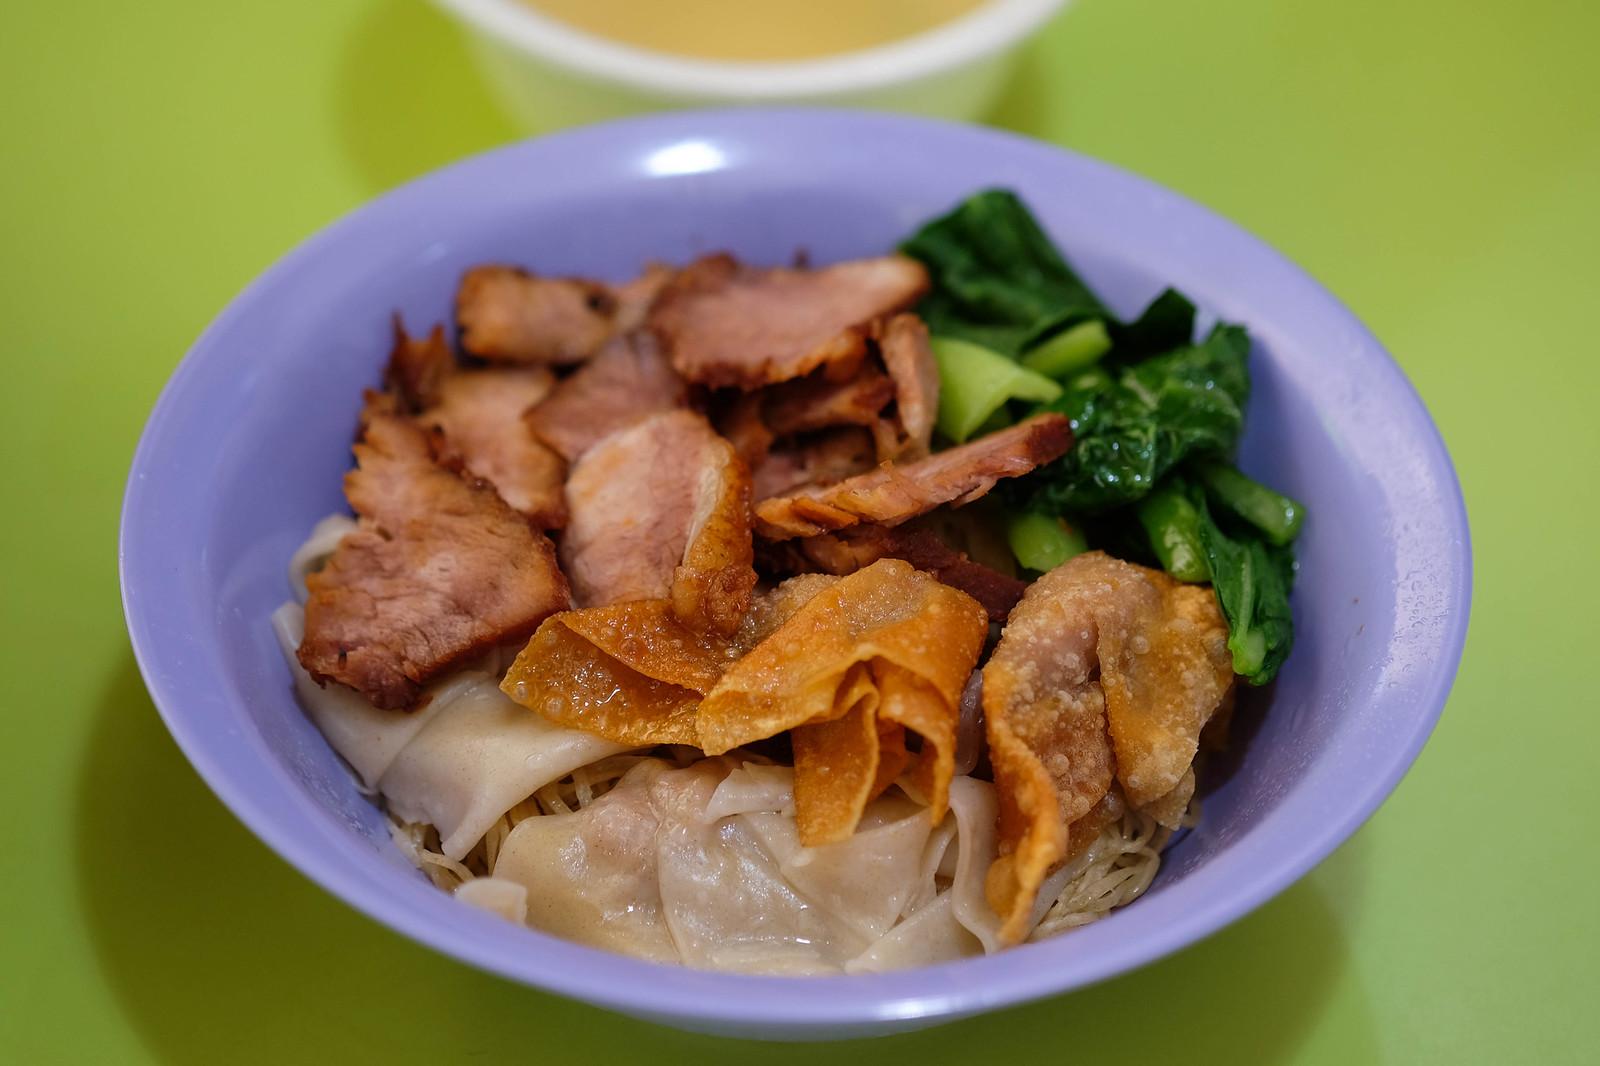 amoy street food centre Truffle mee_1